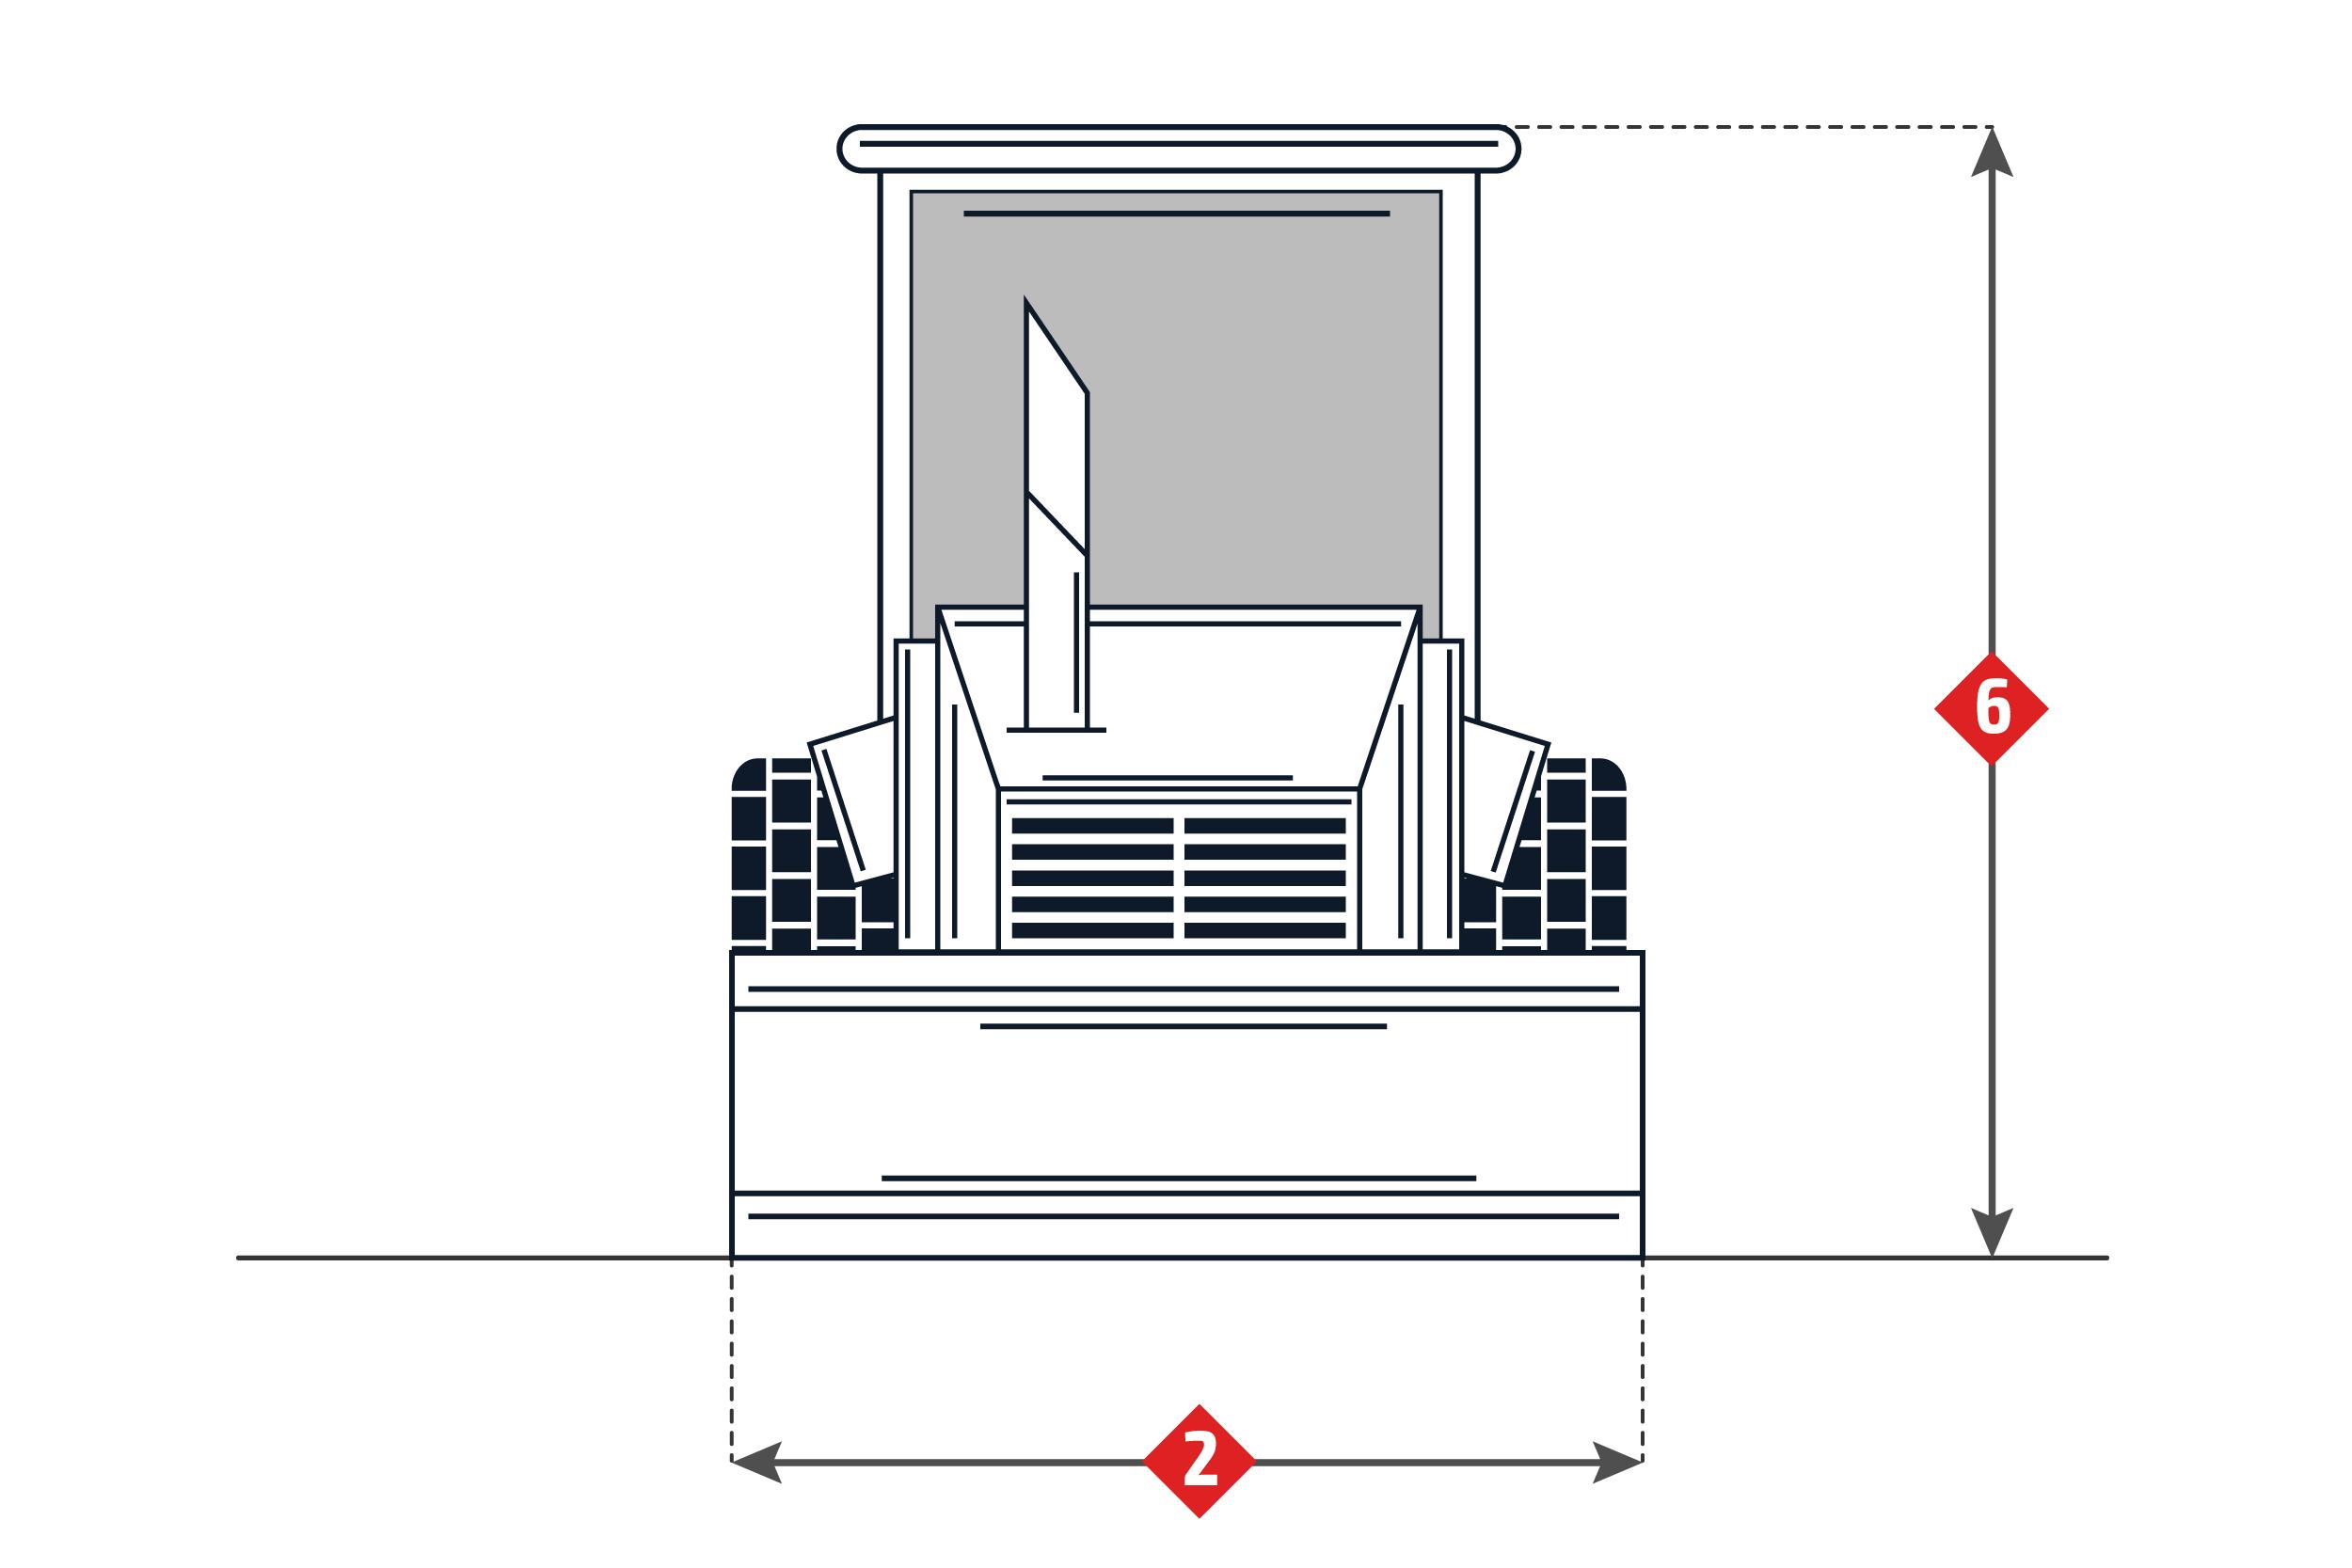 John Deere 410 Tractor | Wiring Diagram Database